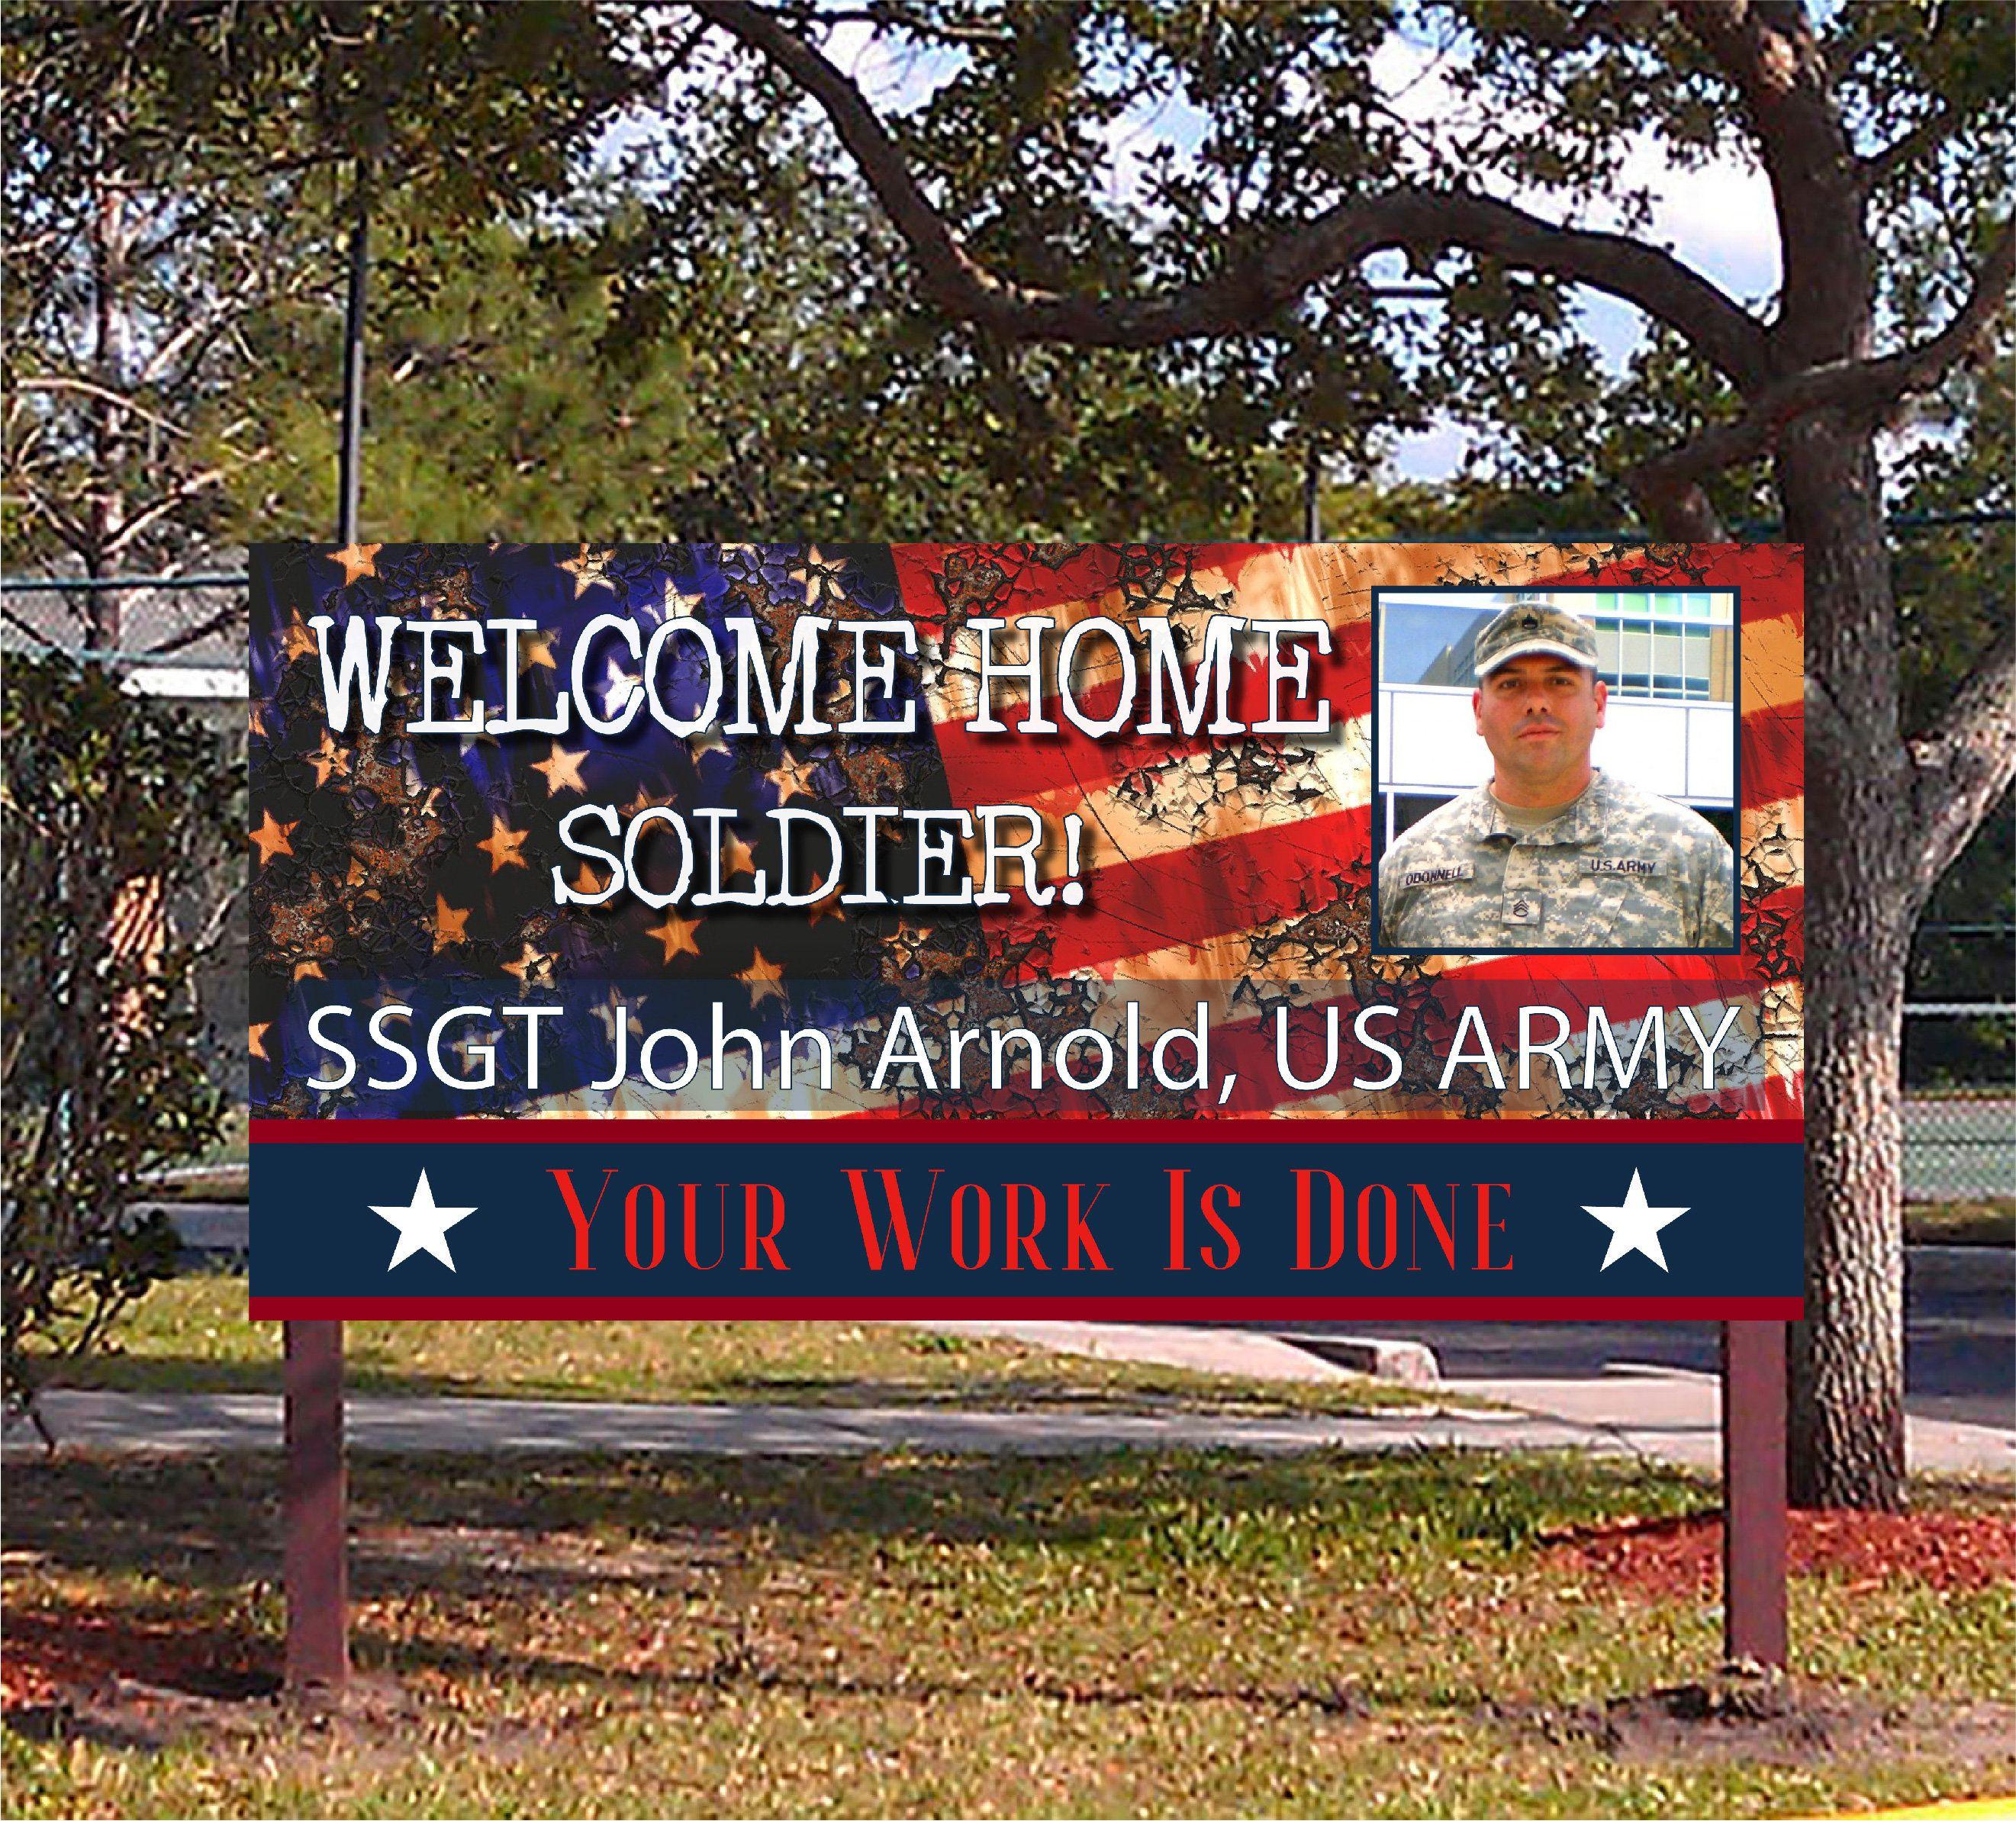 Custom military home printed hd banner sign